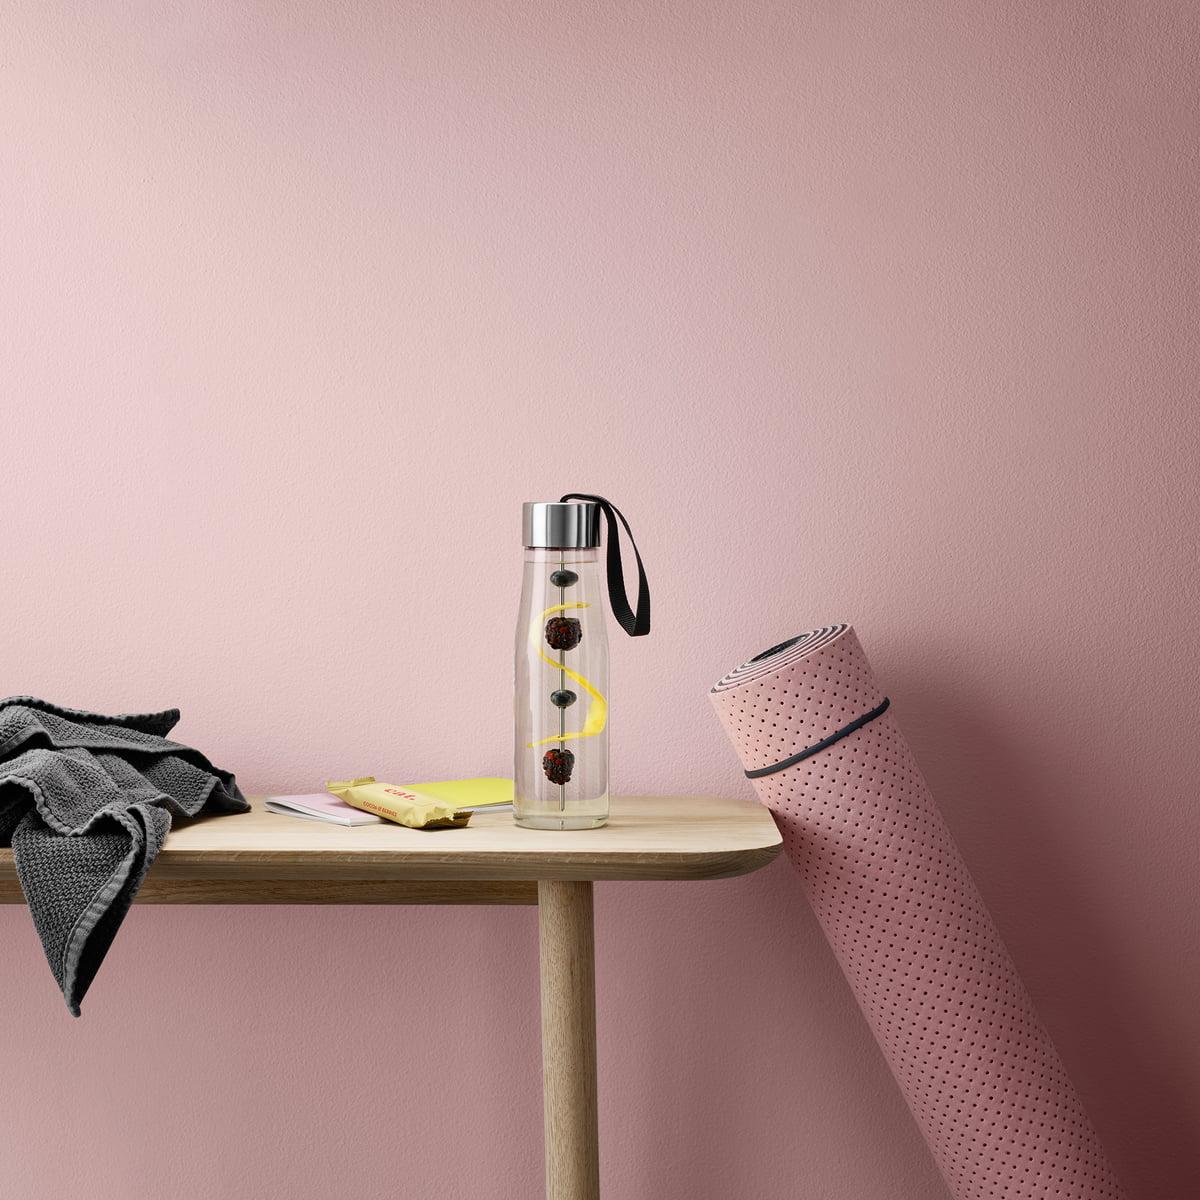 myflavour trinkflasche von eva solo connox. Black Bedroom Furniture Sets. Home Design Ideas